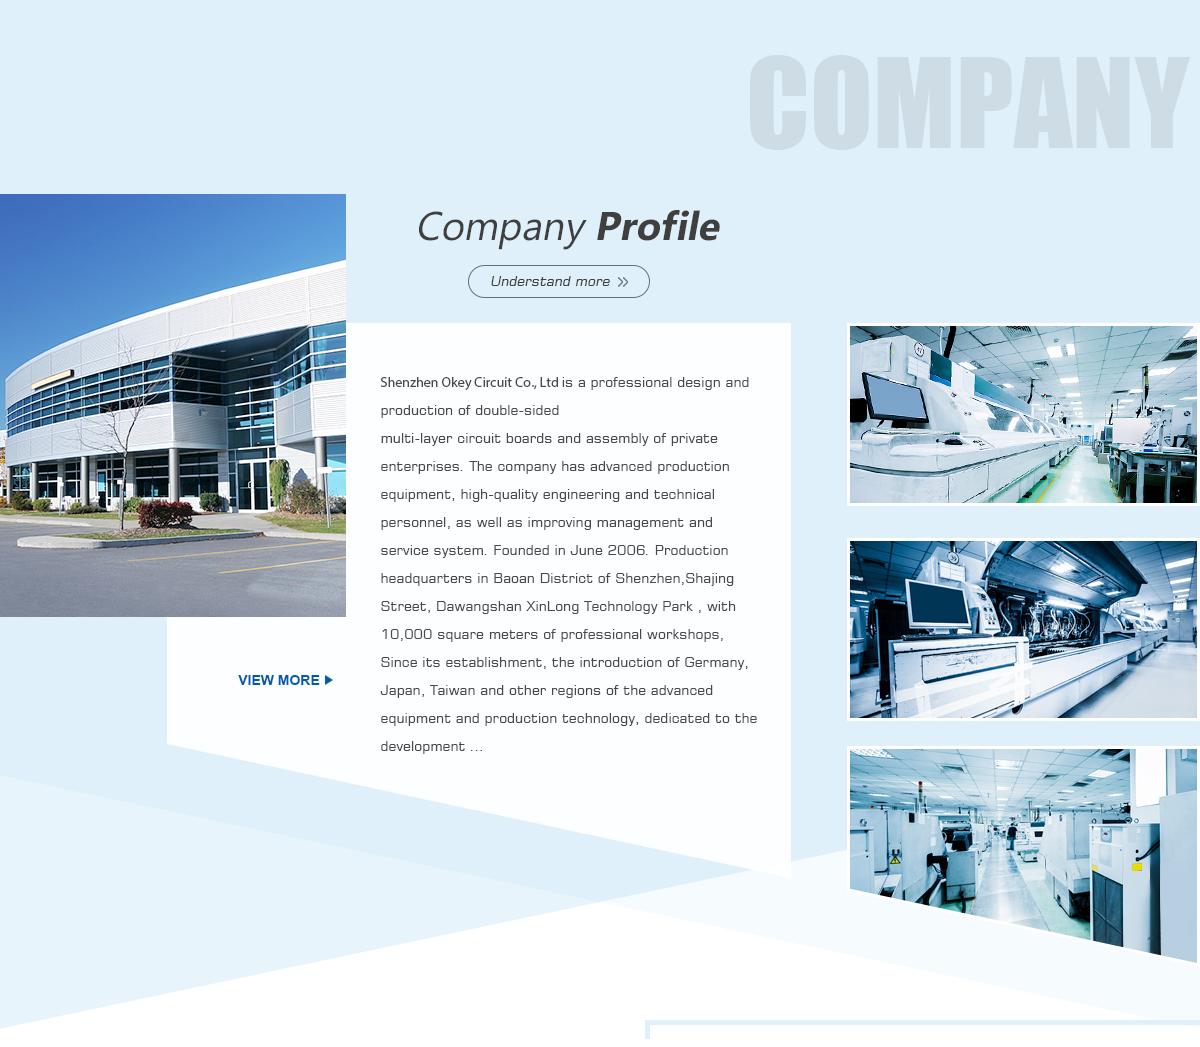 Shenzhen Okey Circuit Co Ltd Pcb Assembly Oem Electronic Printed Board Manufacturerpcb